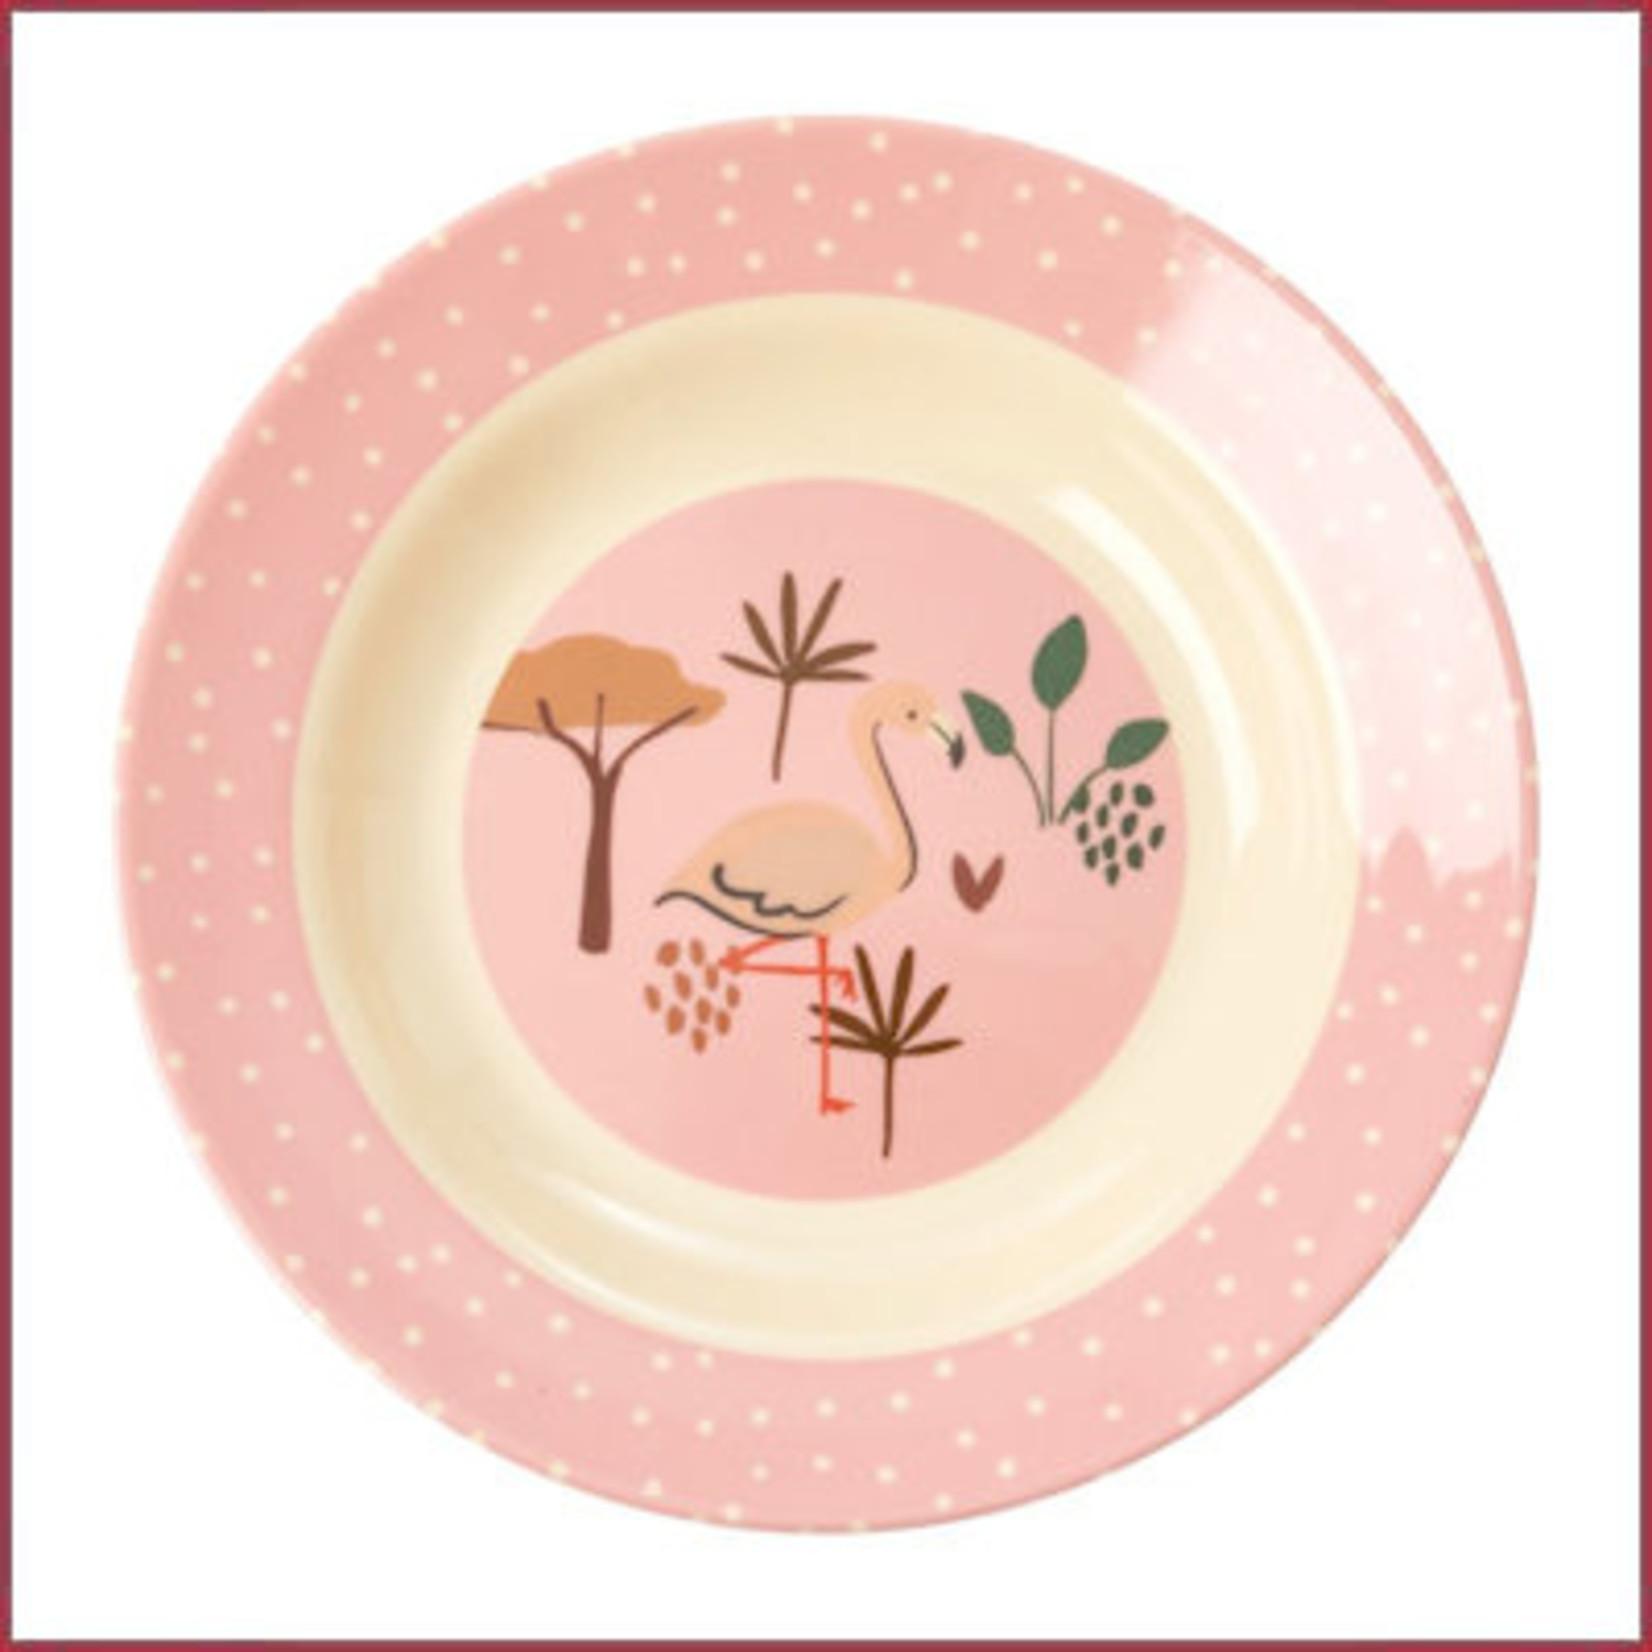 Rice Rice melamine diep kinderbordje met jungle dierenprint - roze